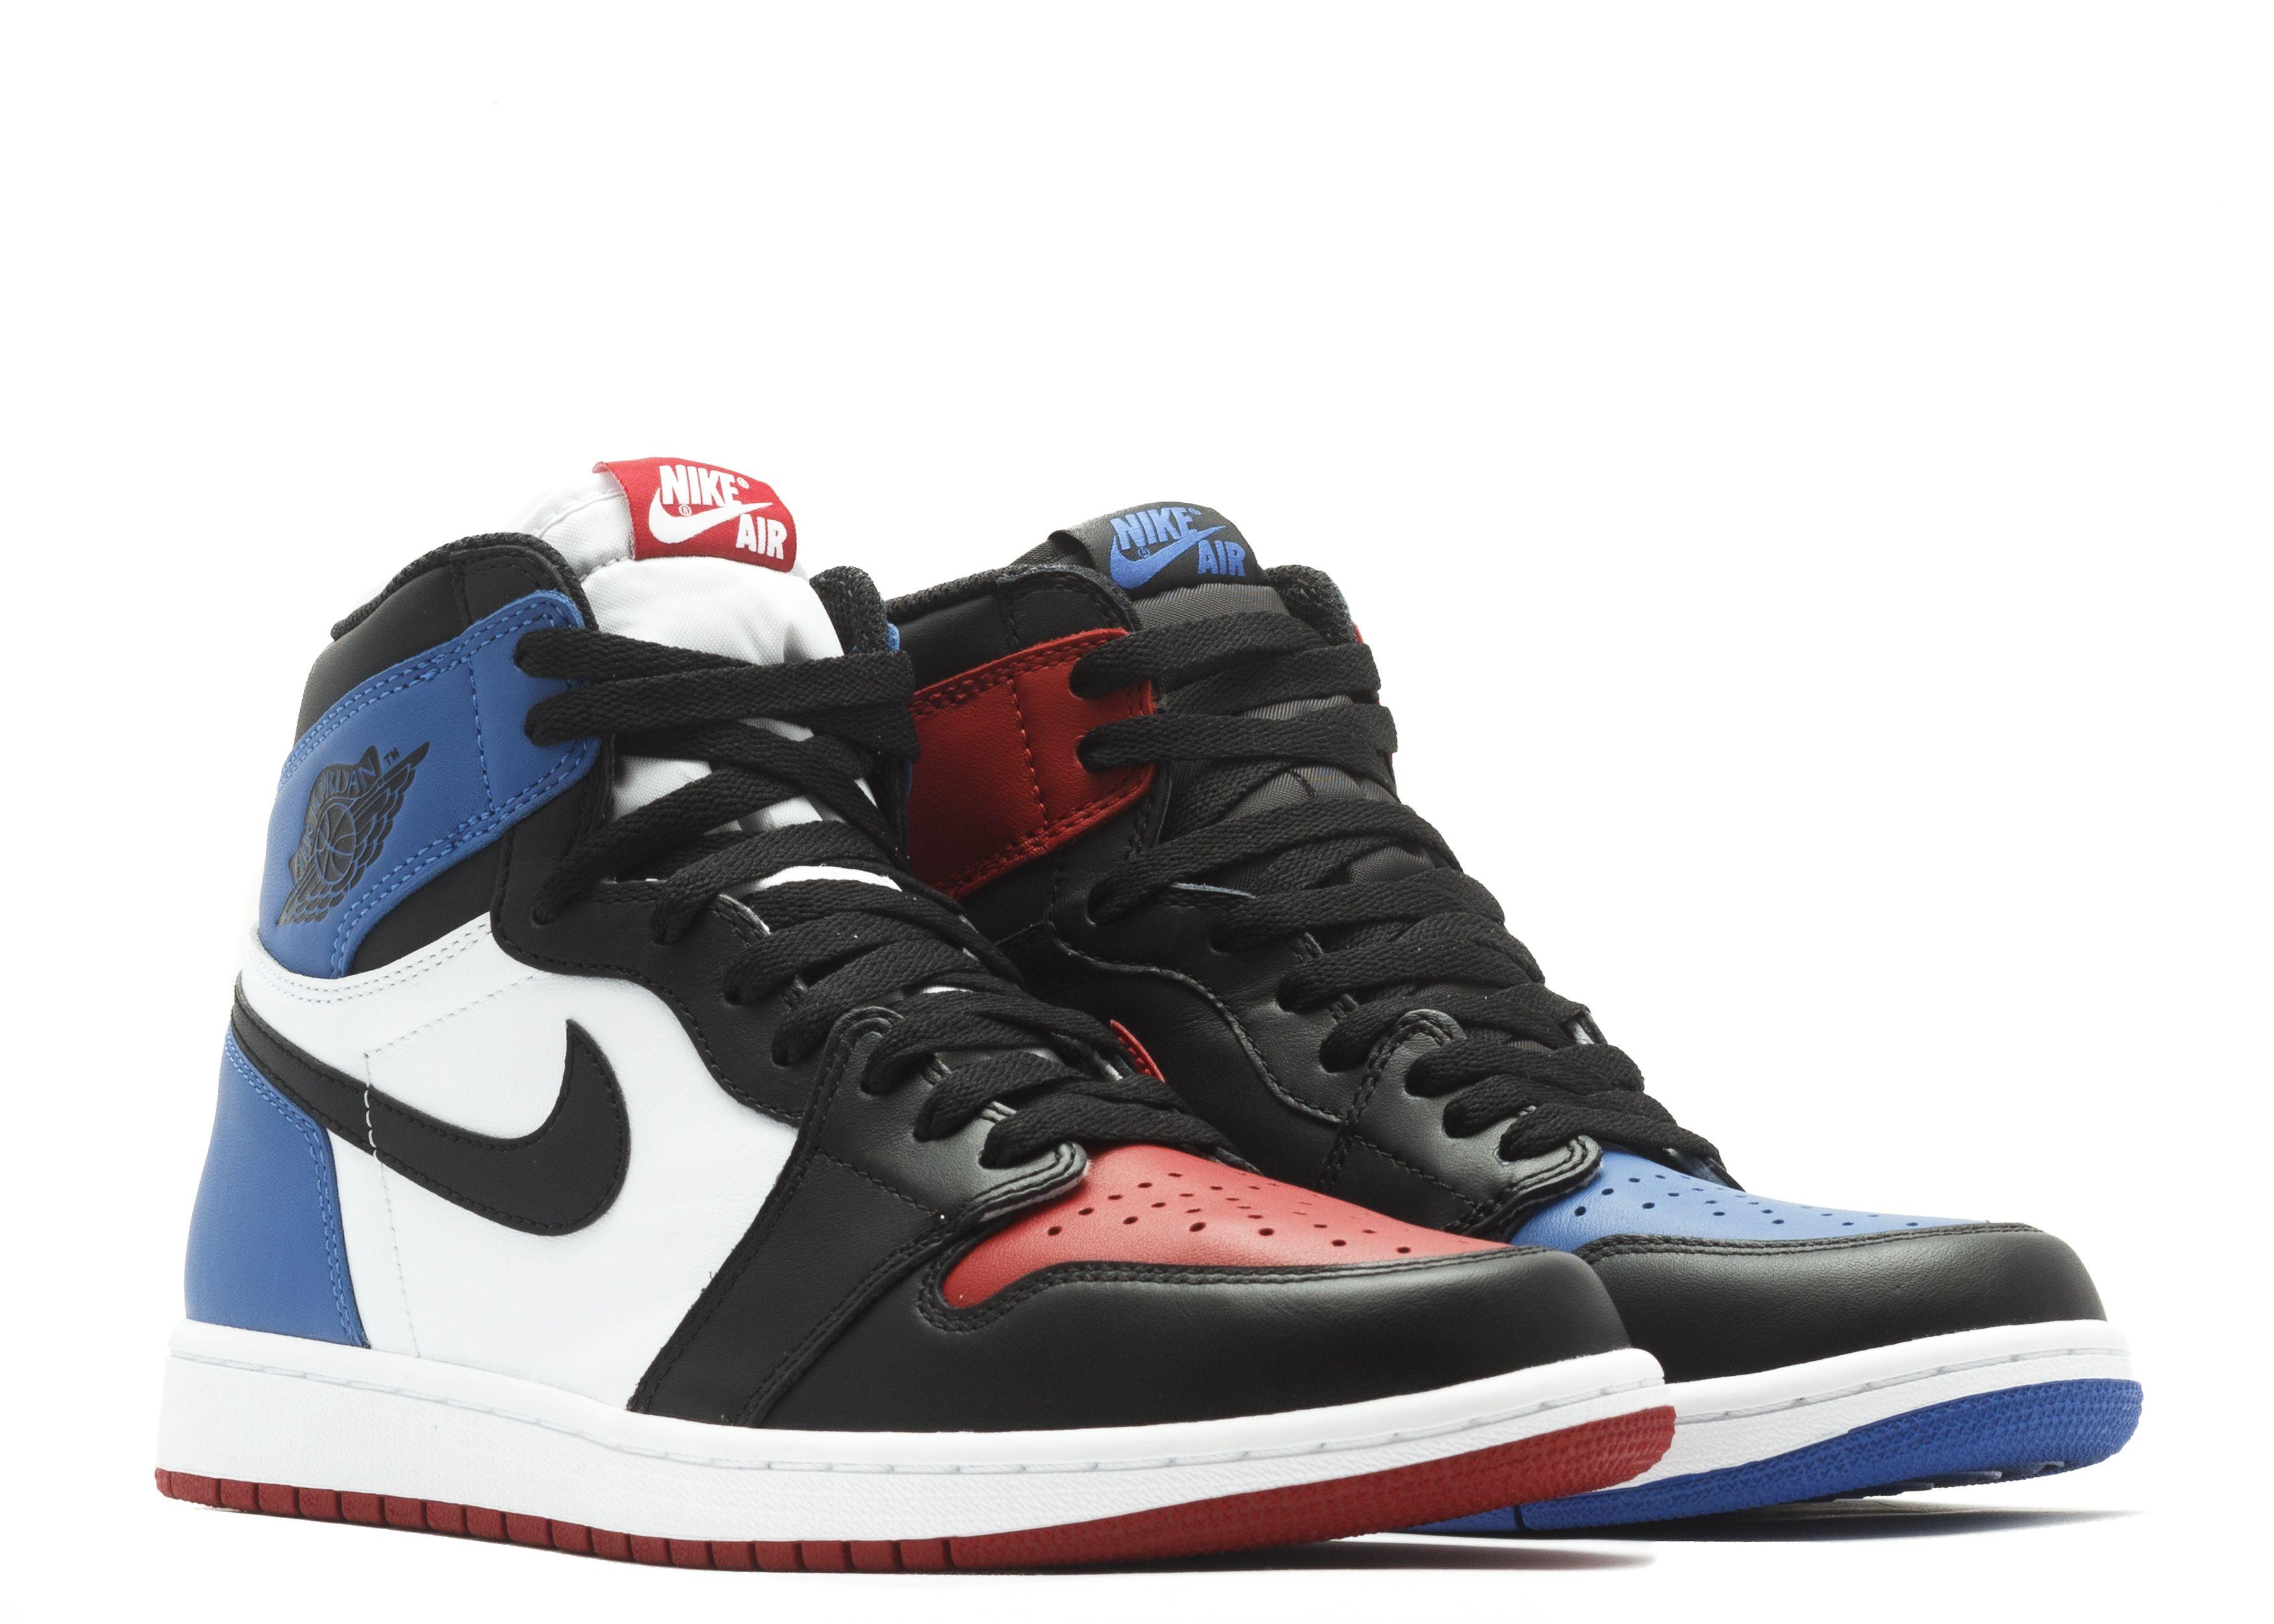 Regardless Of The Cost Men'S Air Jordan Retro 3 Shoes Black Blue Orange